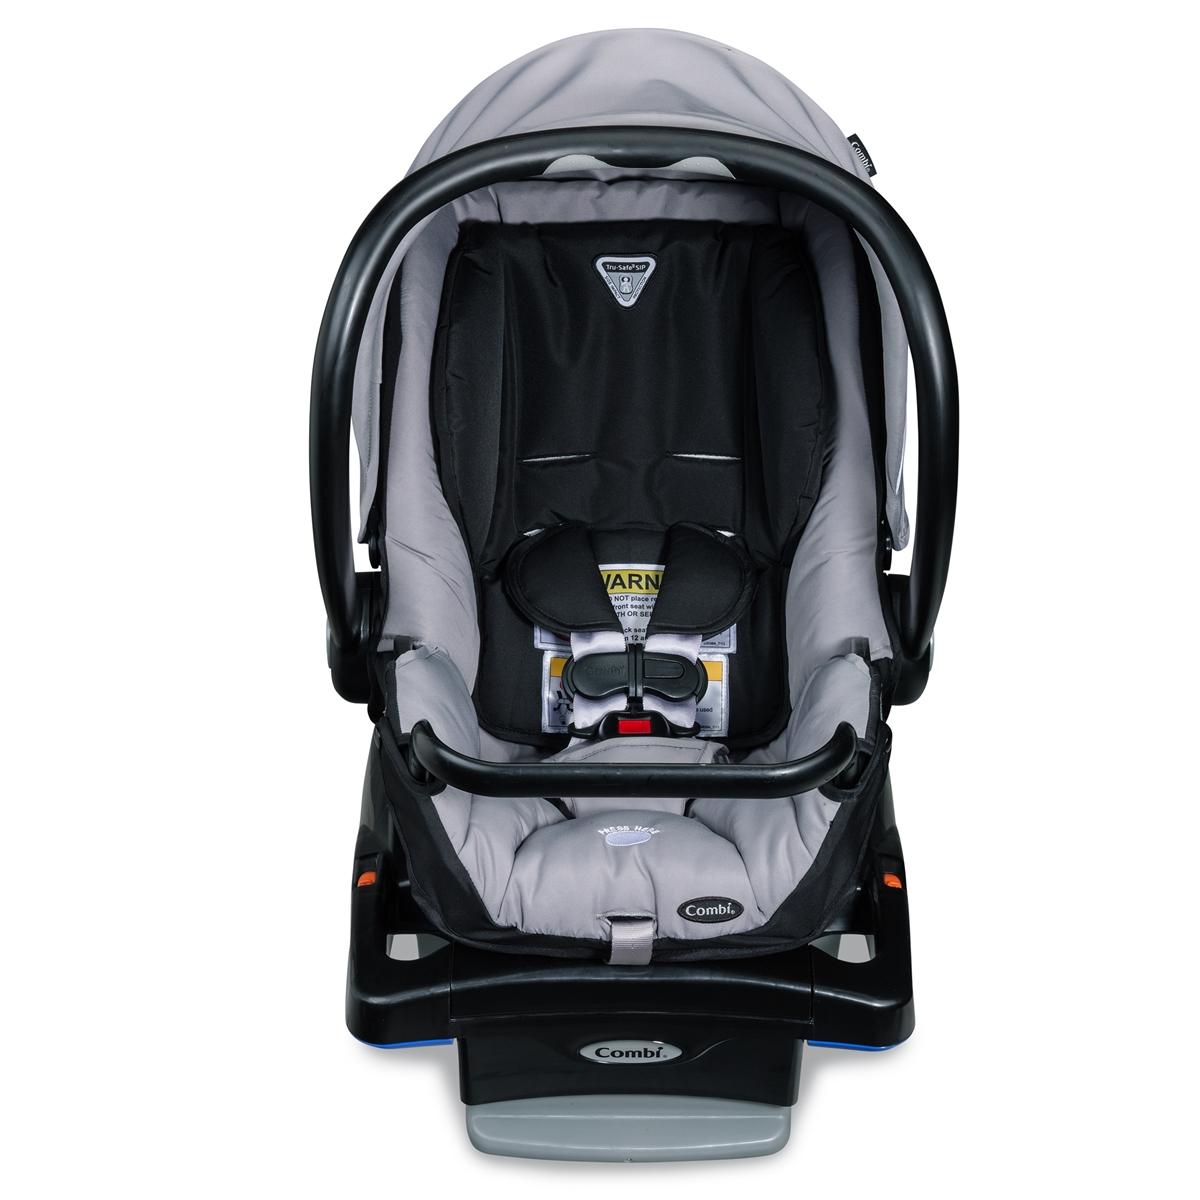 Enjoyable Shuttle Infant Car Seat Alphanode Cool Chair Designs And Ideas Alphanodeonline